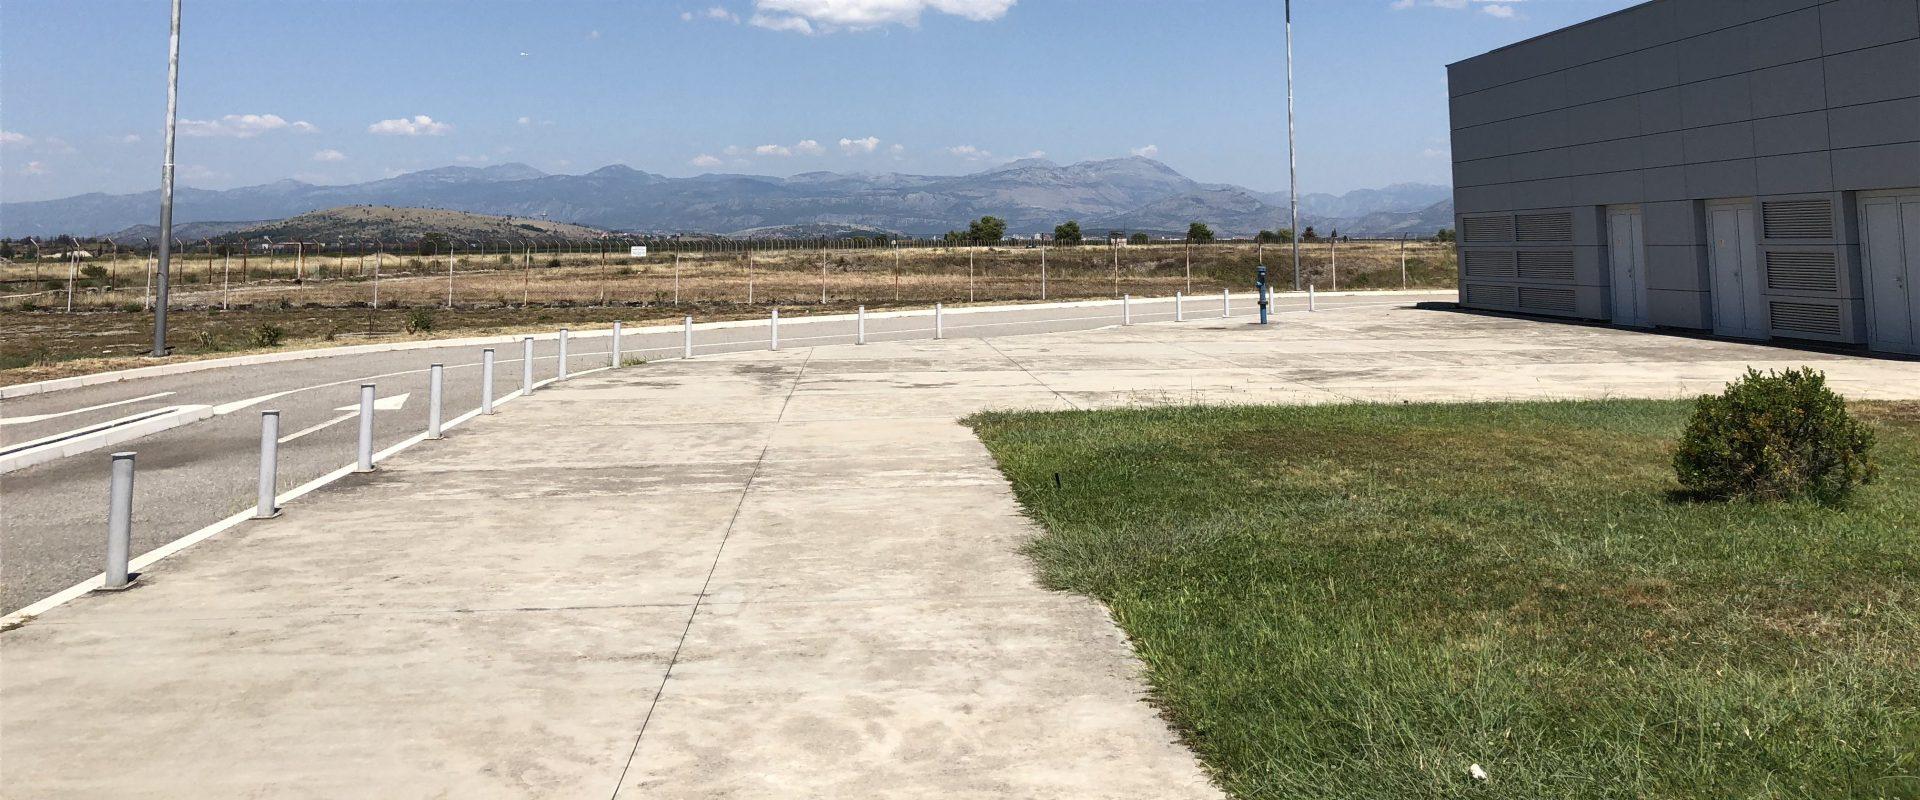 Lotnisko Podgorica